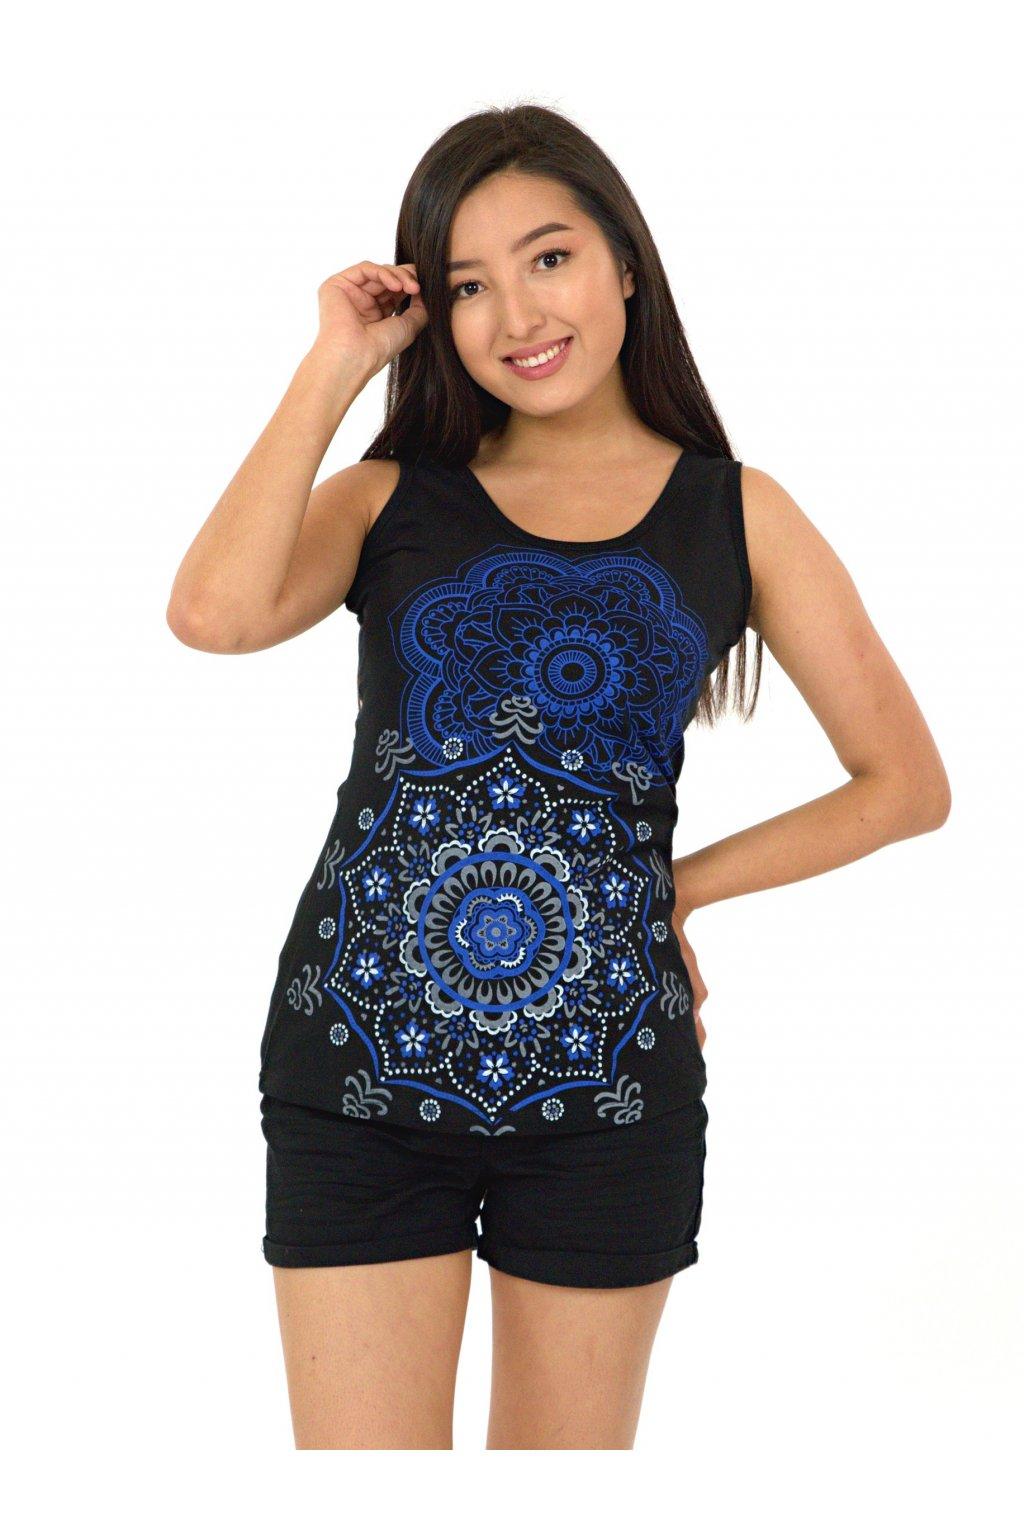 Tílko Haleiwa - černá s modrou